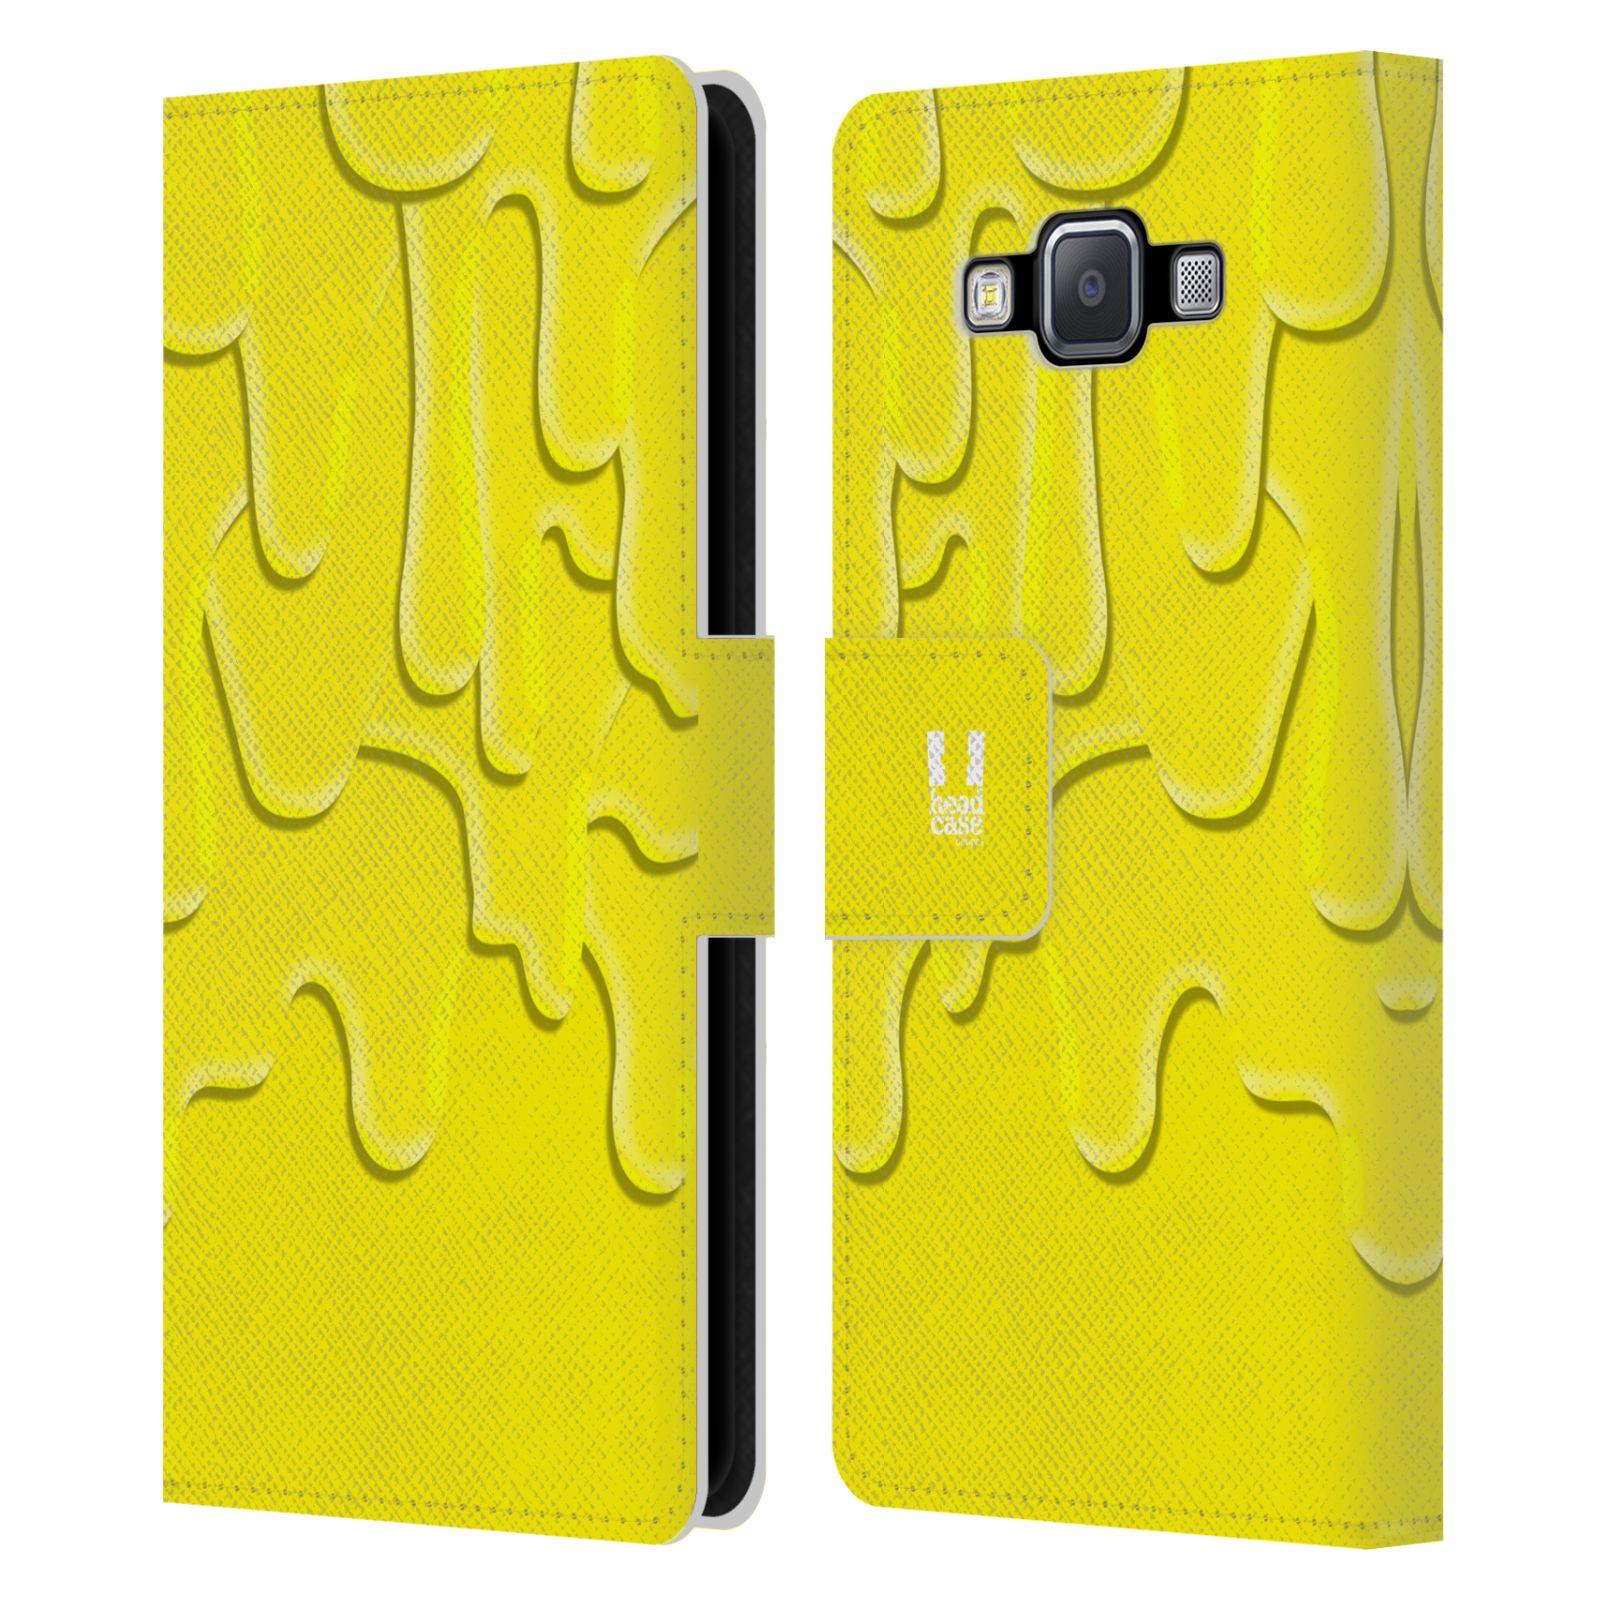 HEAD CASE Flipové pouzdro pro mobil Samsung Galaxy A5 ZÁPLAVA BARVA žlutá